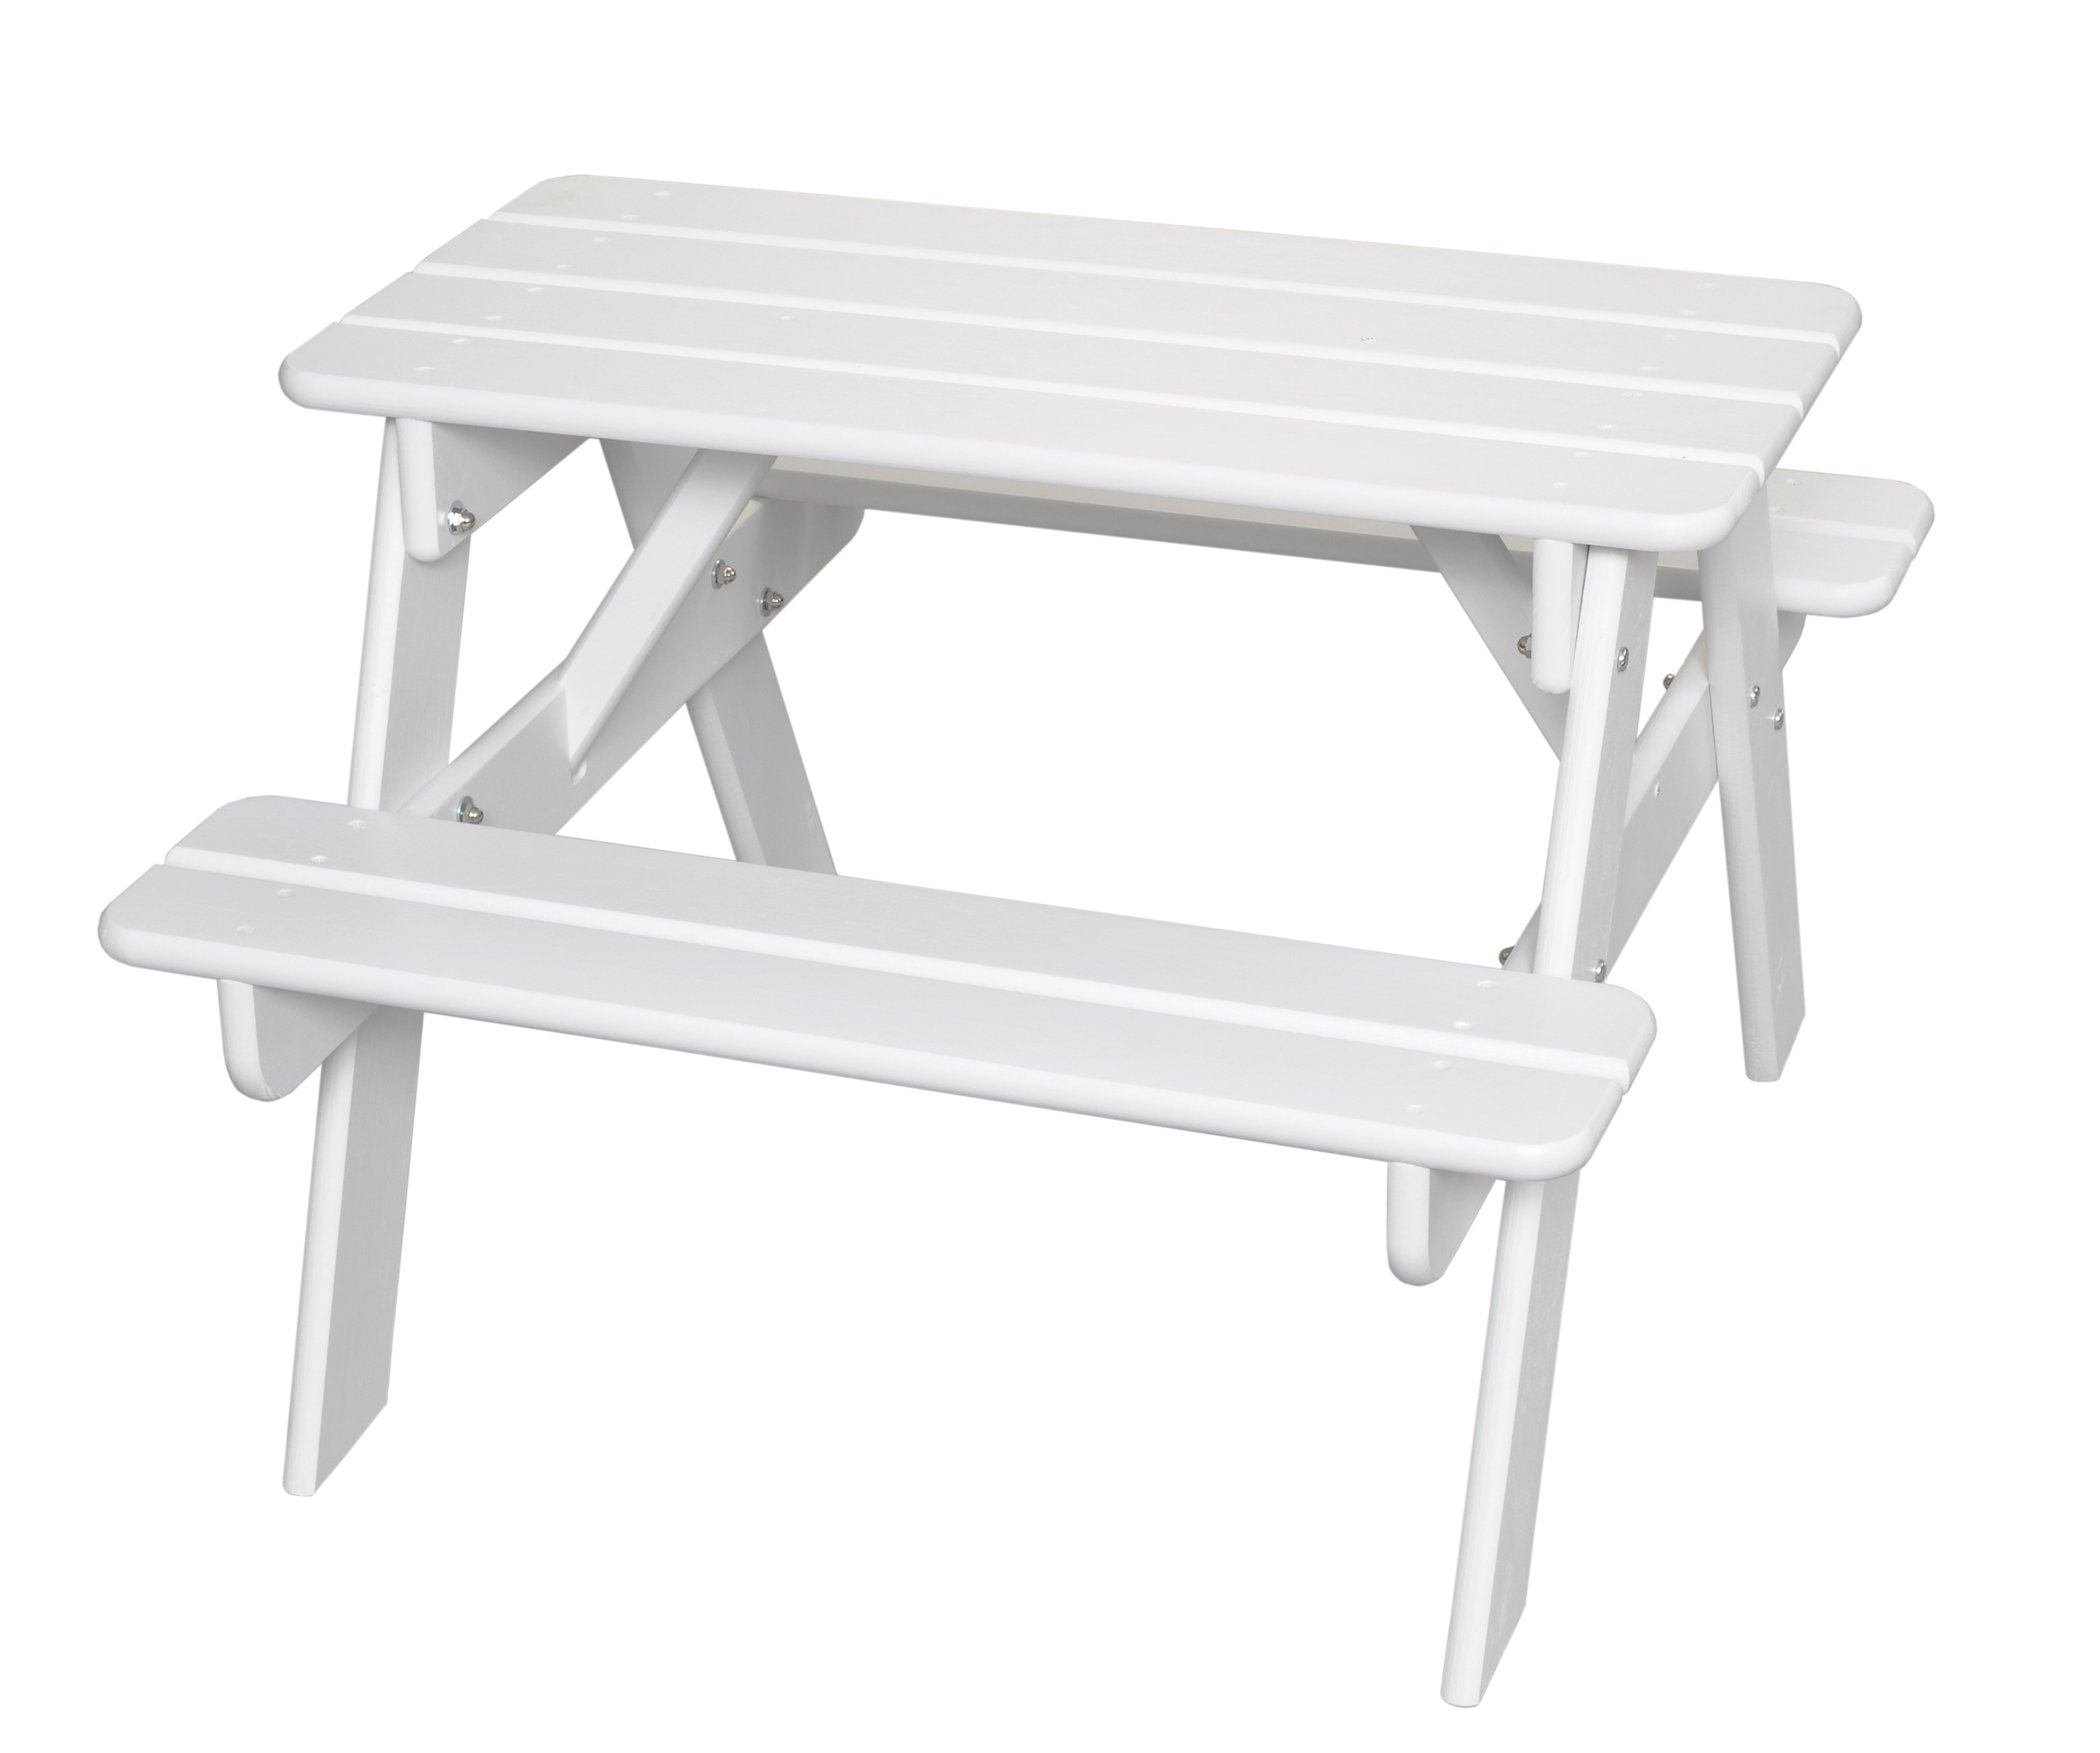 Little Colorado Child's Picnic Table- White by Little Colorado